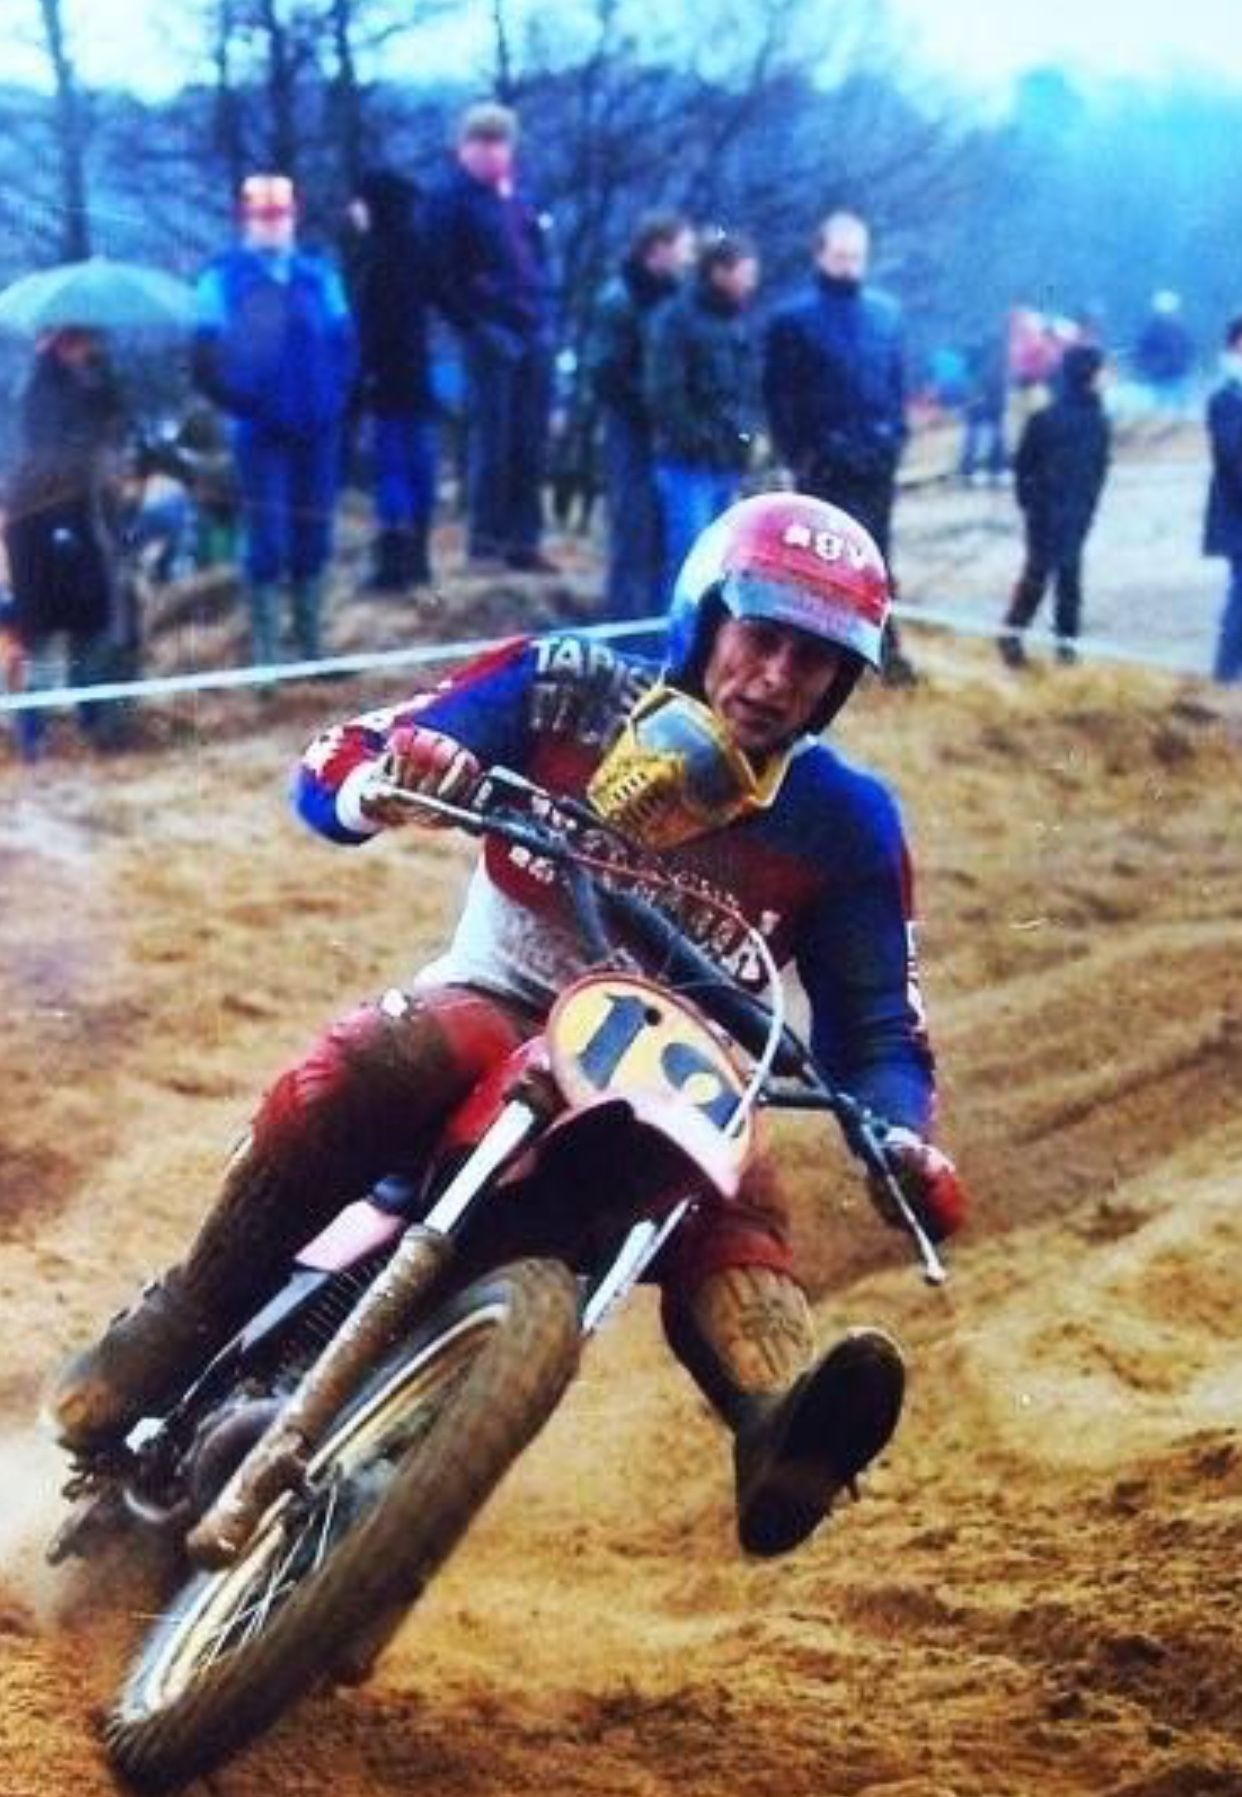 Pin By Deanzurmely On Motocross Photos In 2020 Vintage Motocross Motocross Riders Honda Dirt Bike